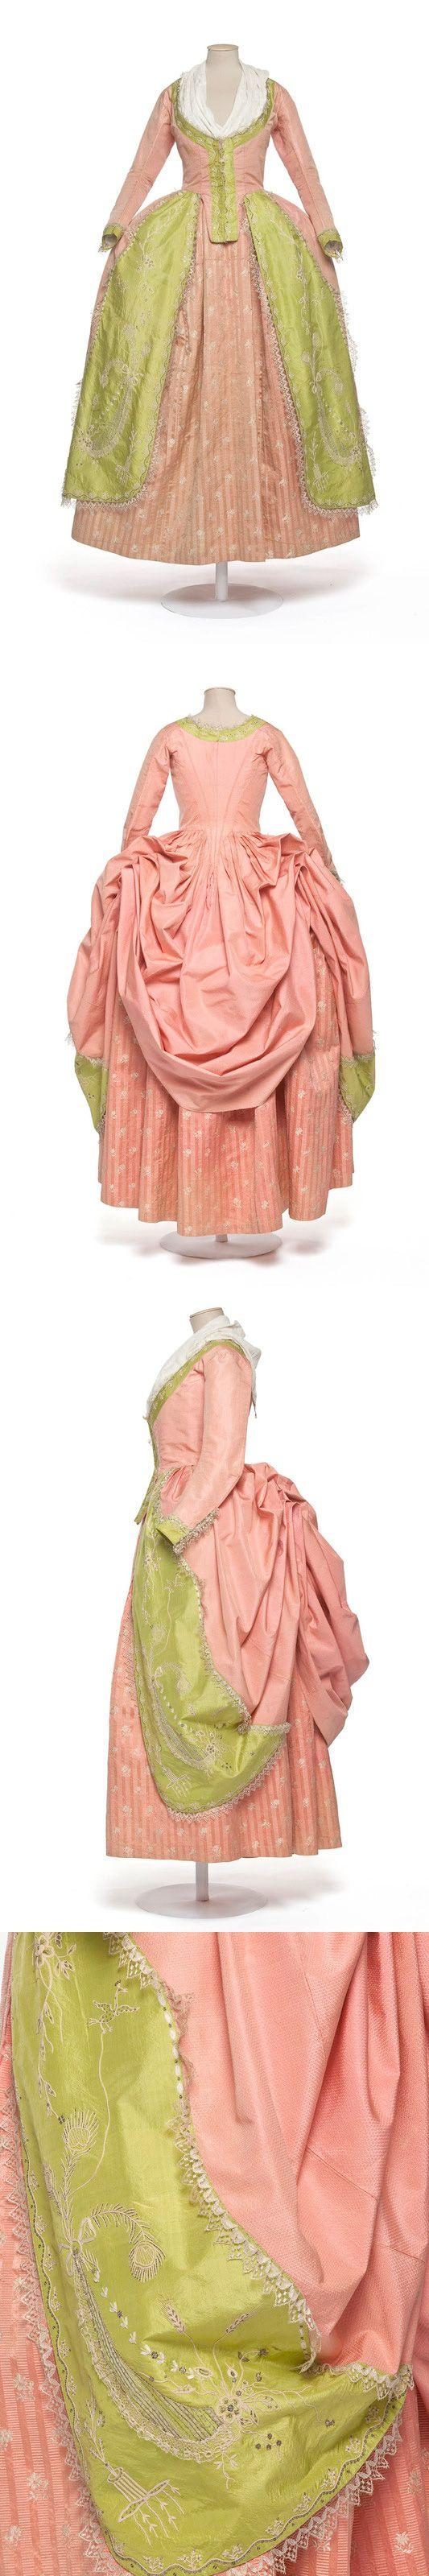 robe à la polonaise, 1780-1785, France, Taffeta, silk